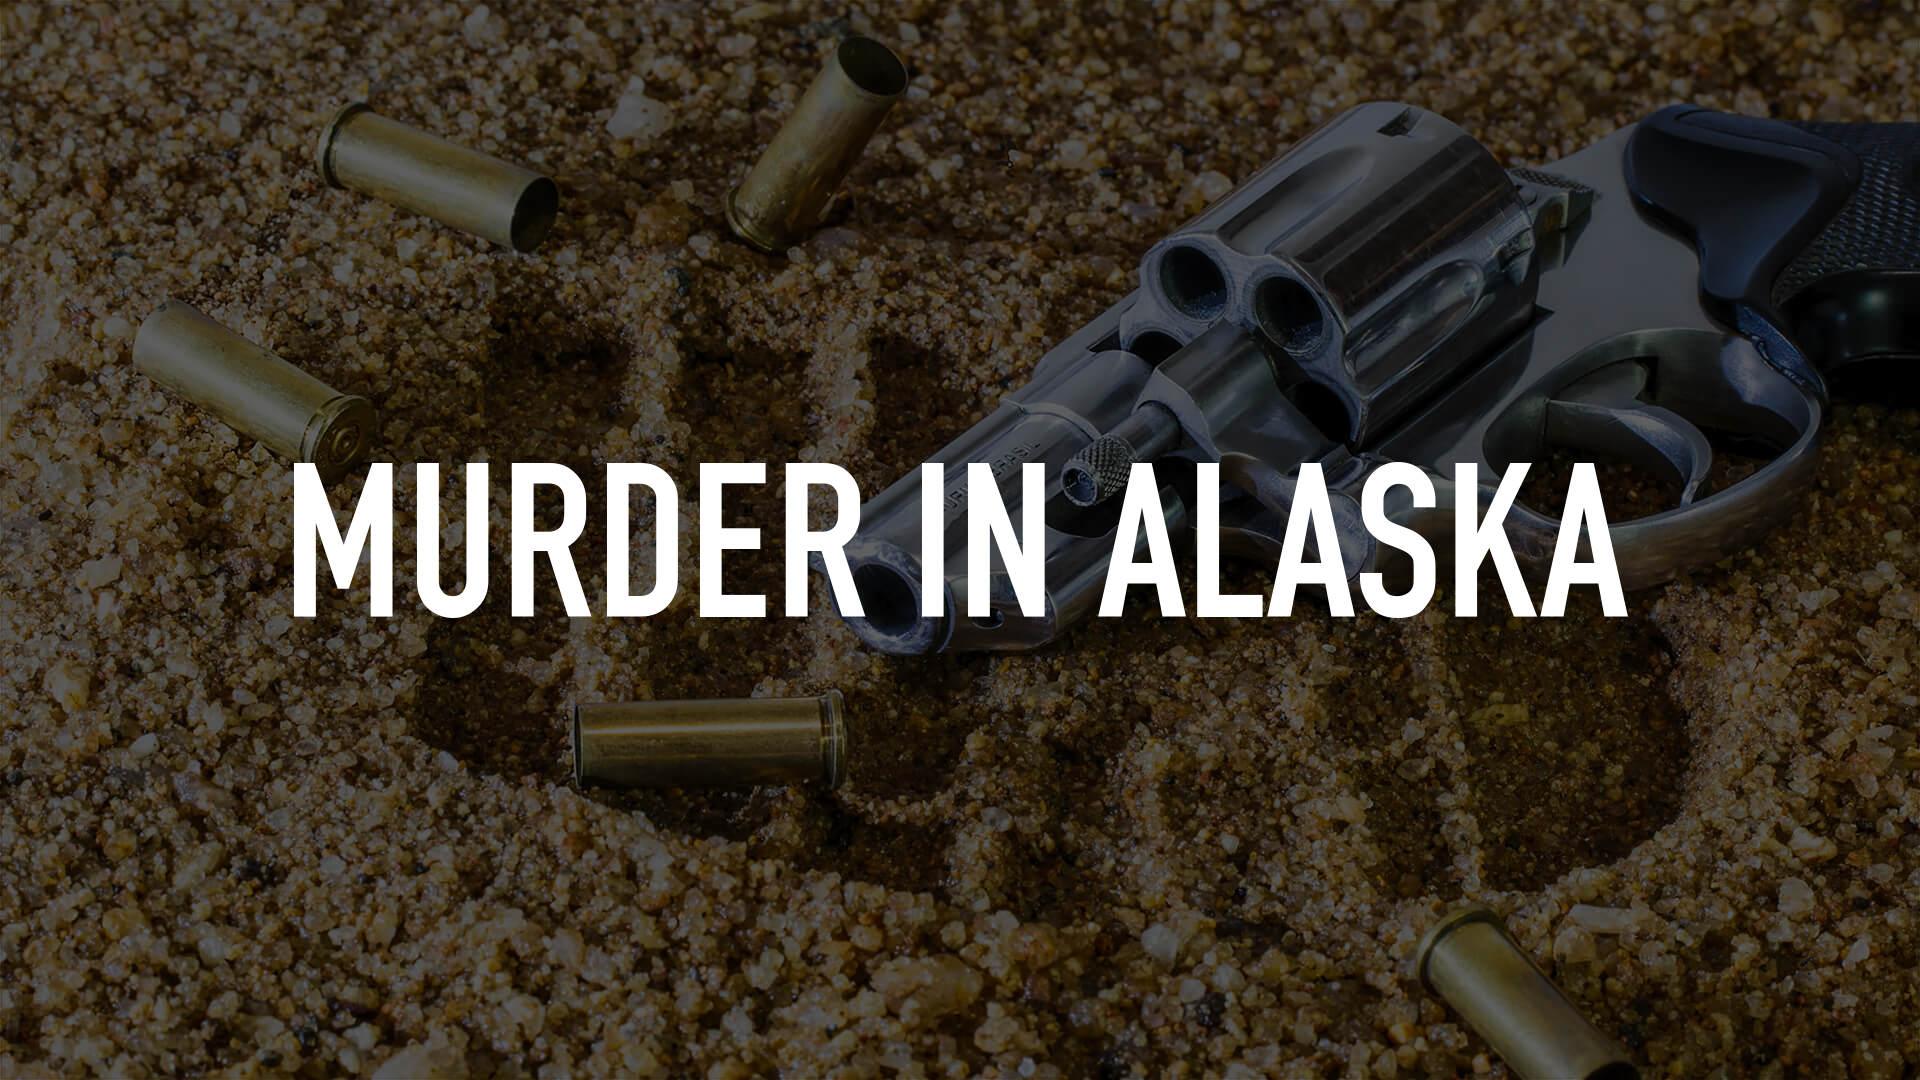 Murder in Alaska